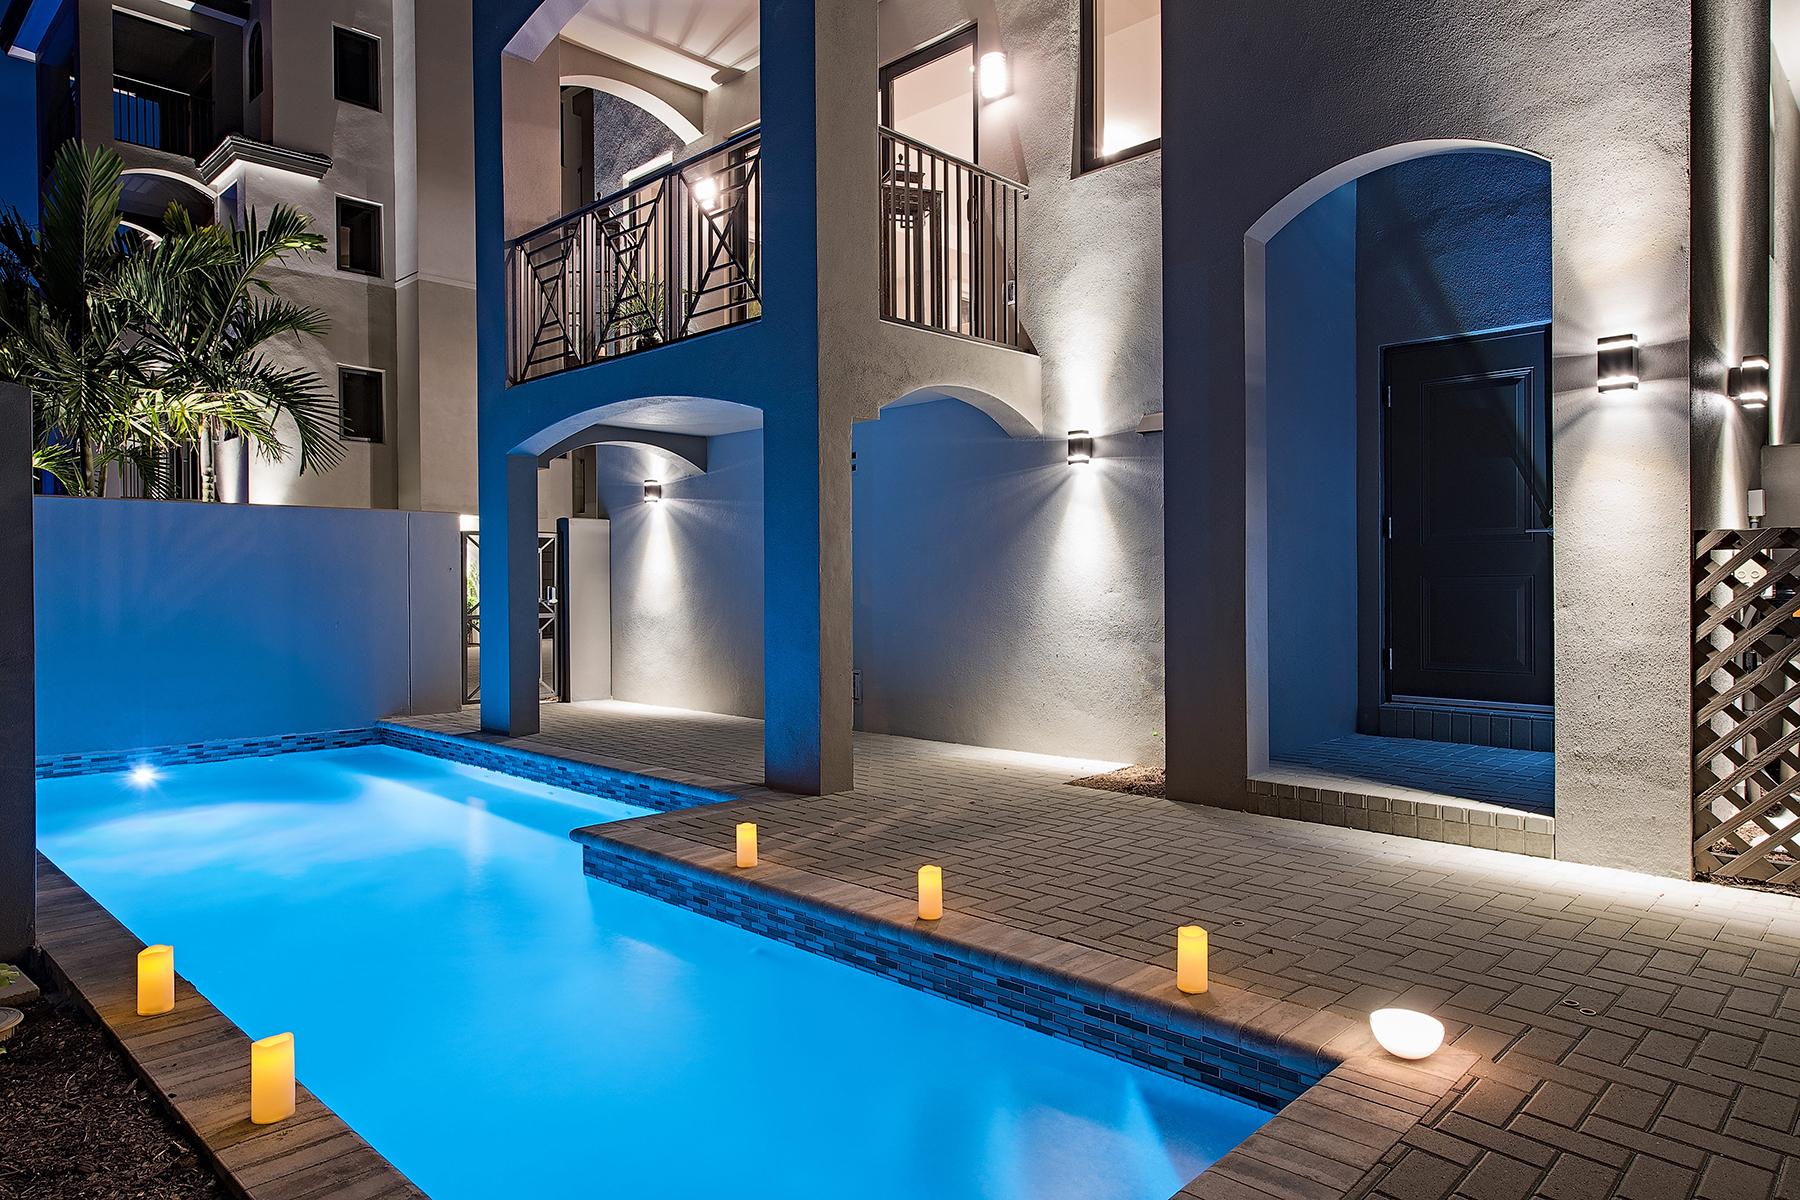 sales property at OLD NAPLES - ESMERALDA ON EIGHTH